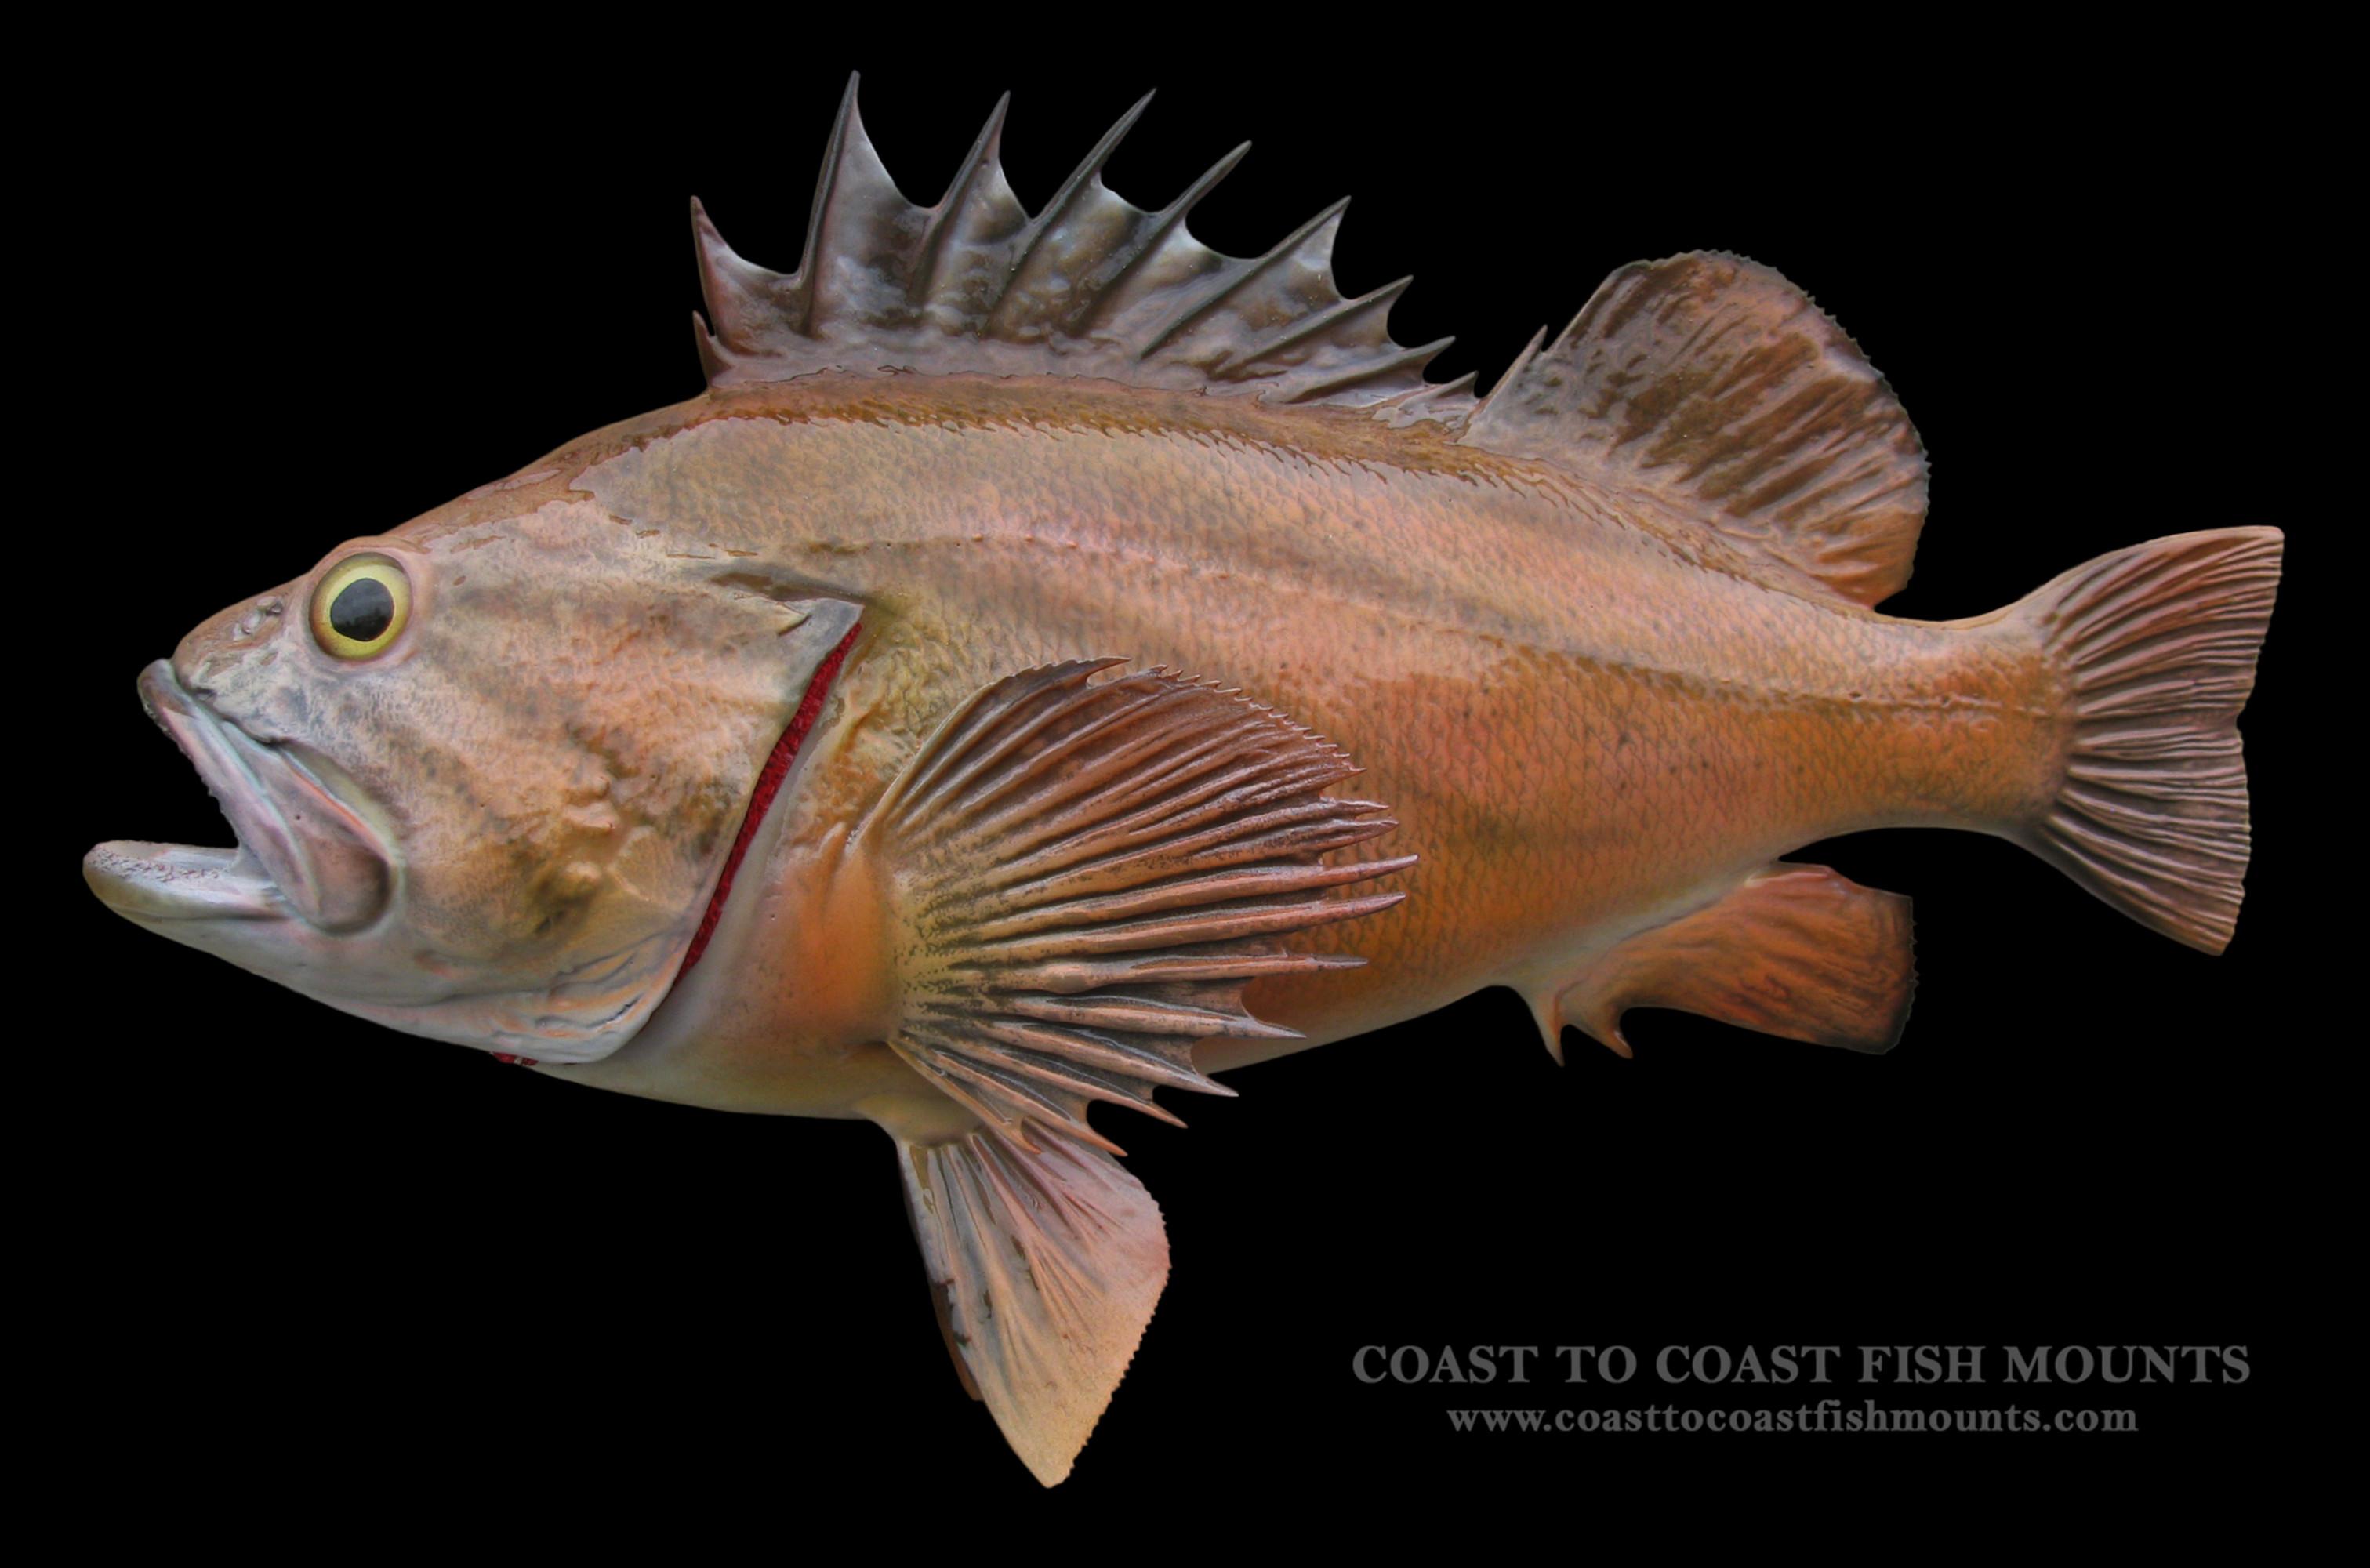 Rock Fish (Vermilion) Fish Mount and Fish Replicas | Coast-to-Coast